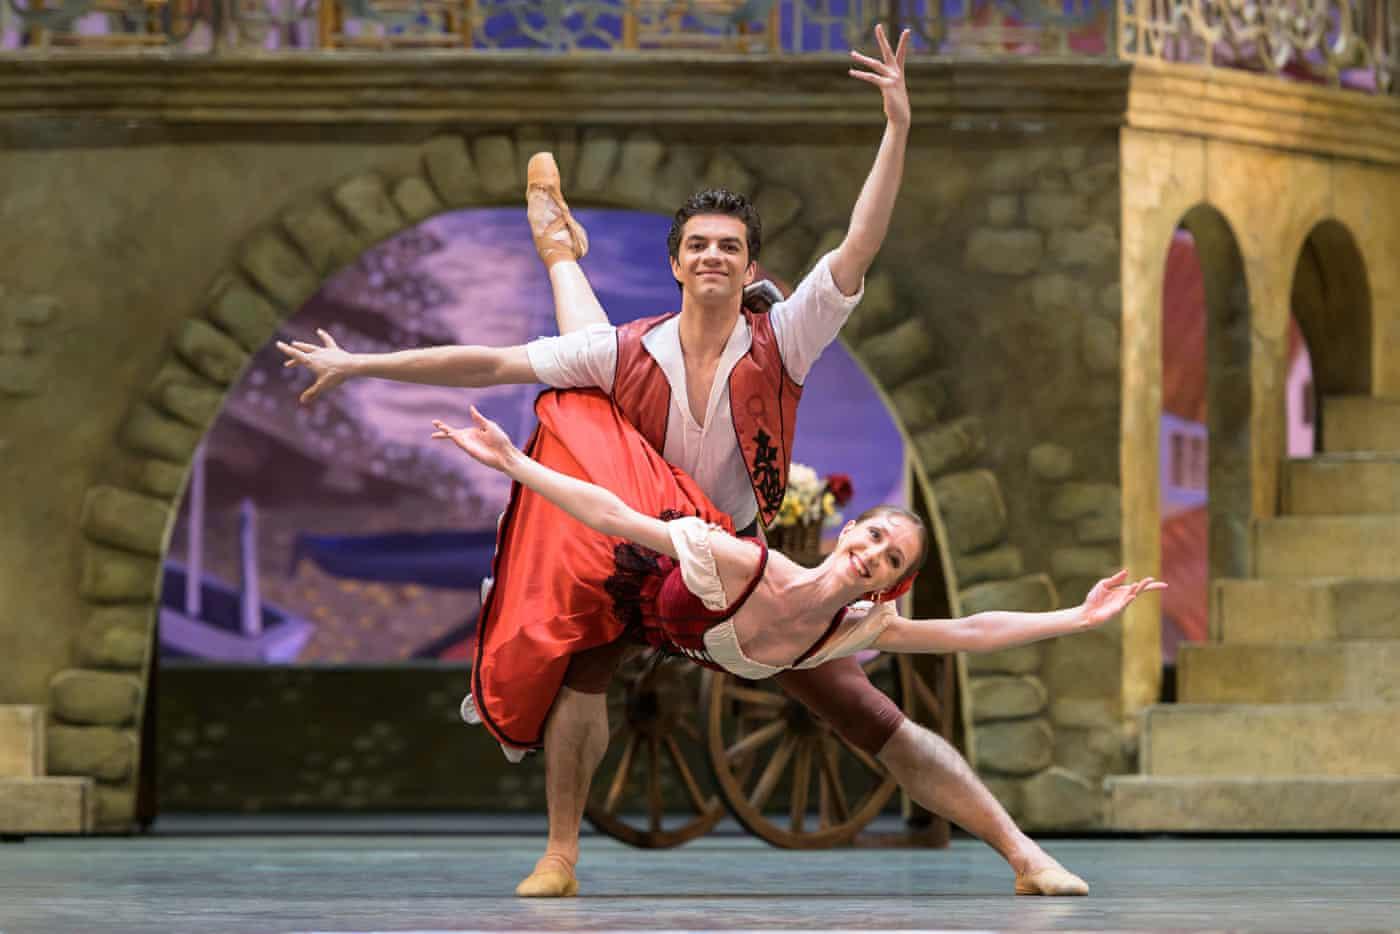 Bolshoi Ballet: Don Quixote review – makes the heart sing